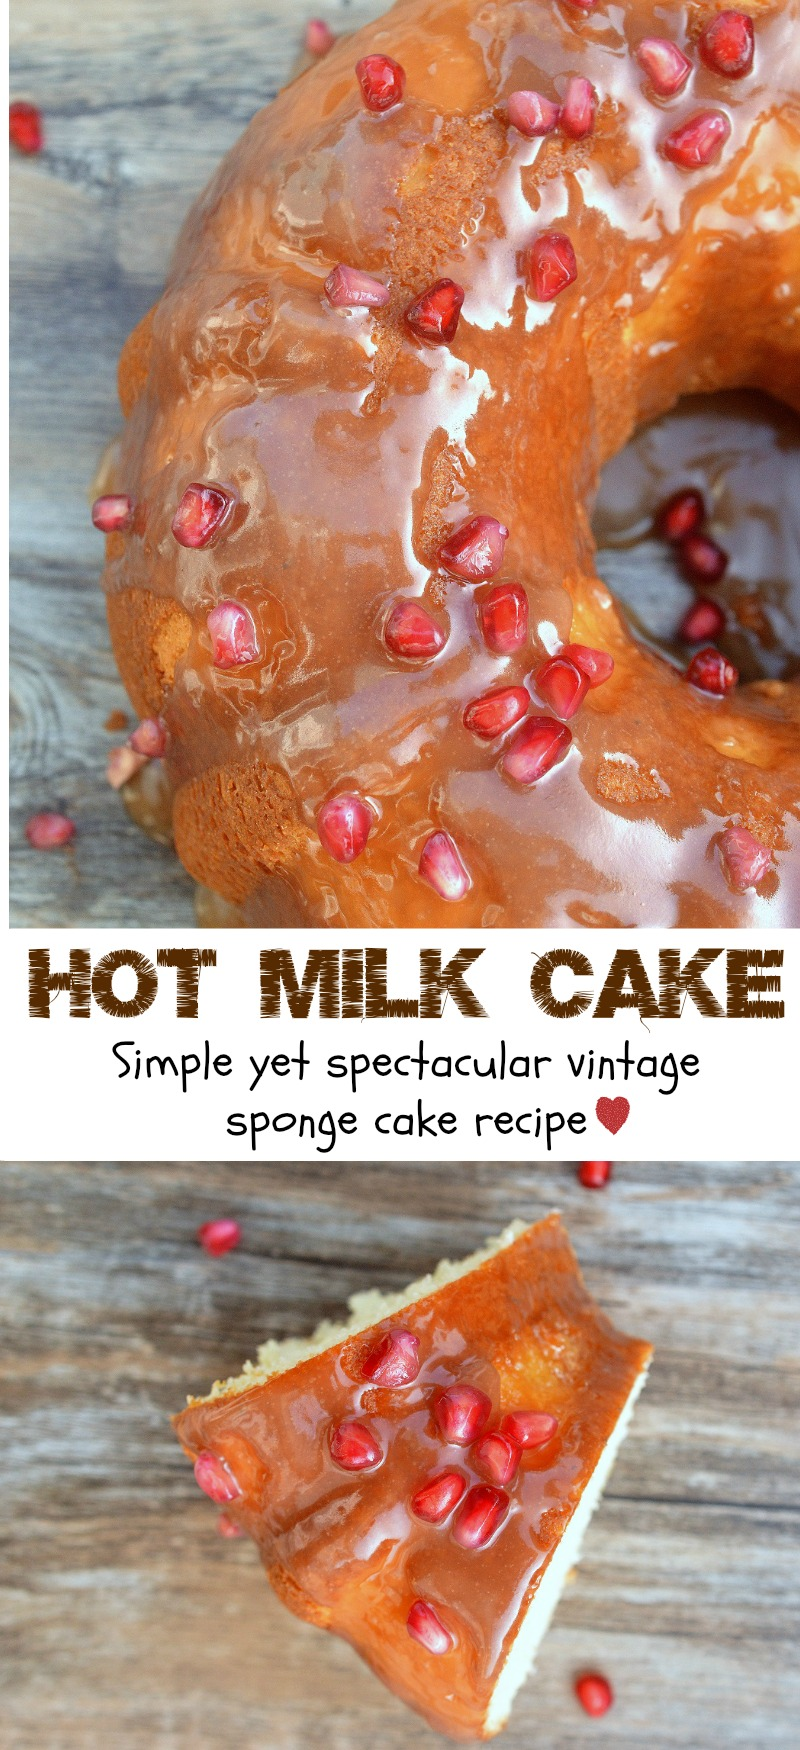 Hot Milk Cake Recipe - This vintage sponge cake recipe is simple yet spectacular!